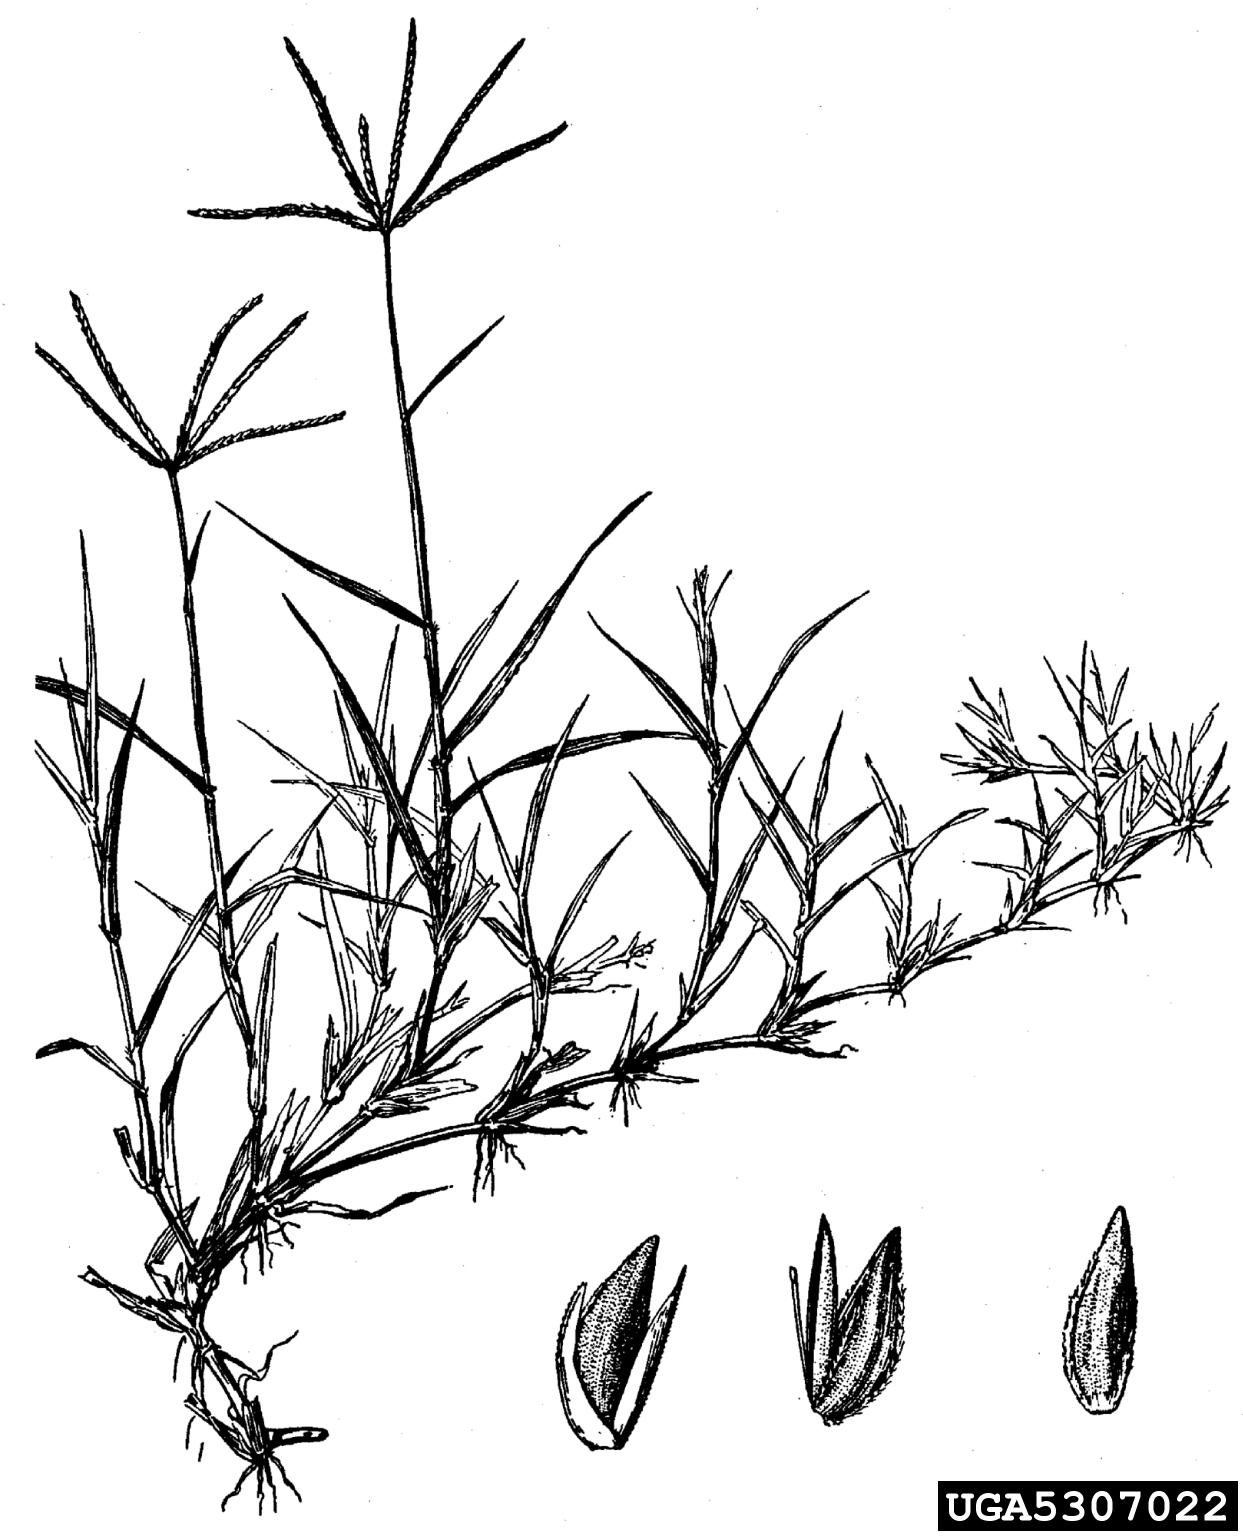 bermudagrass: Cynodon dactylon (Cyperales: Poaceae)